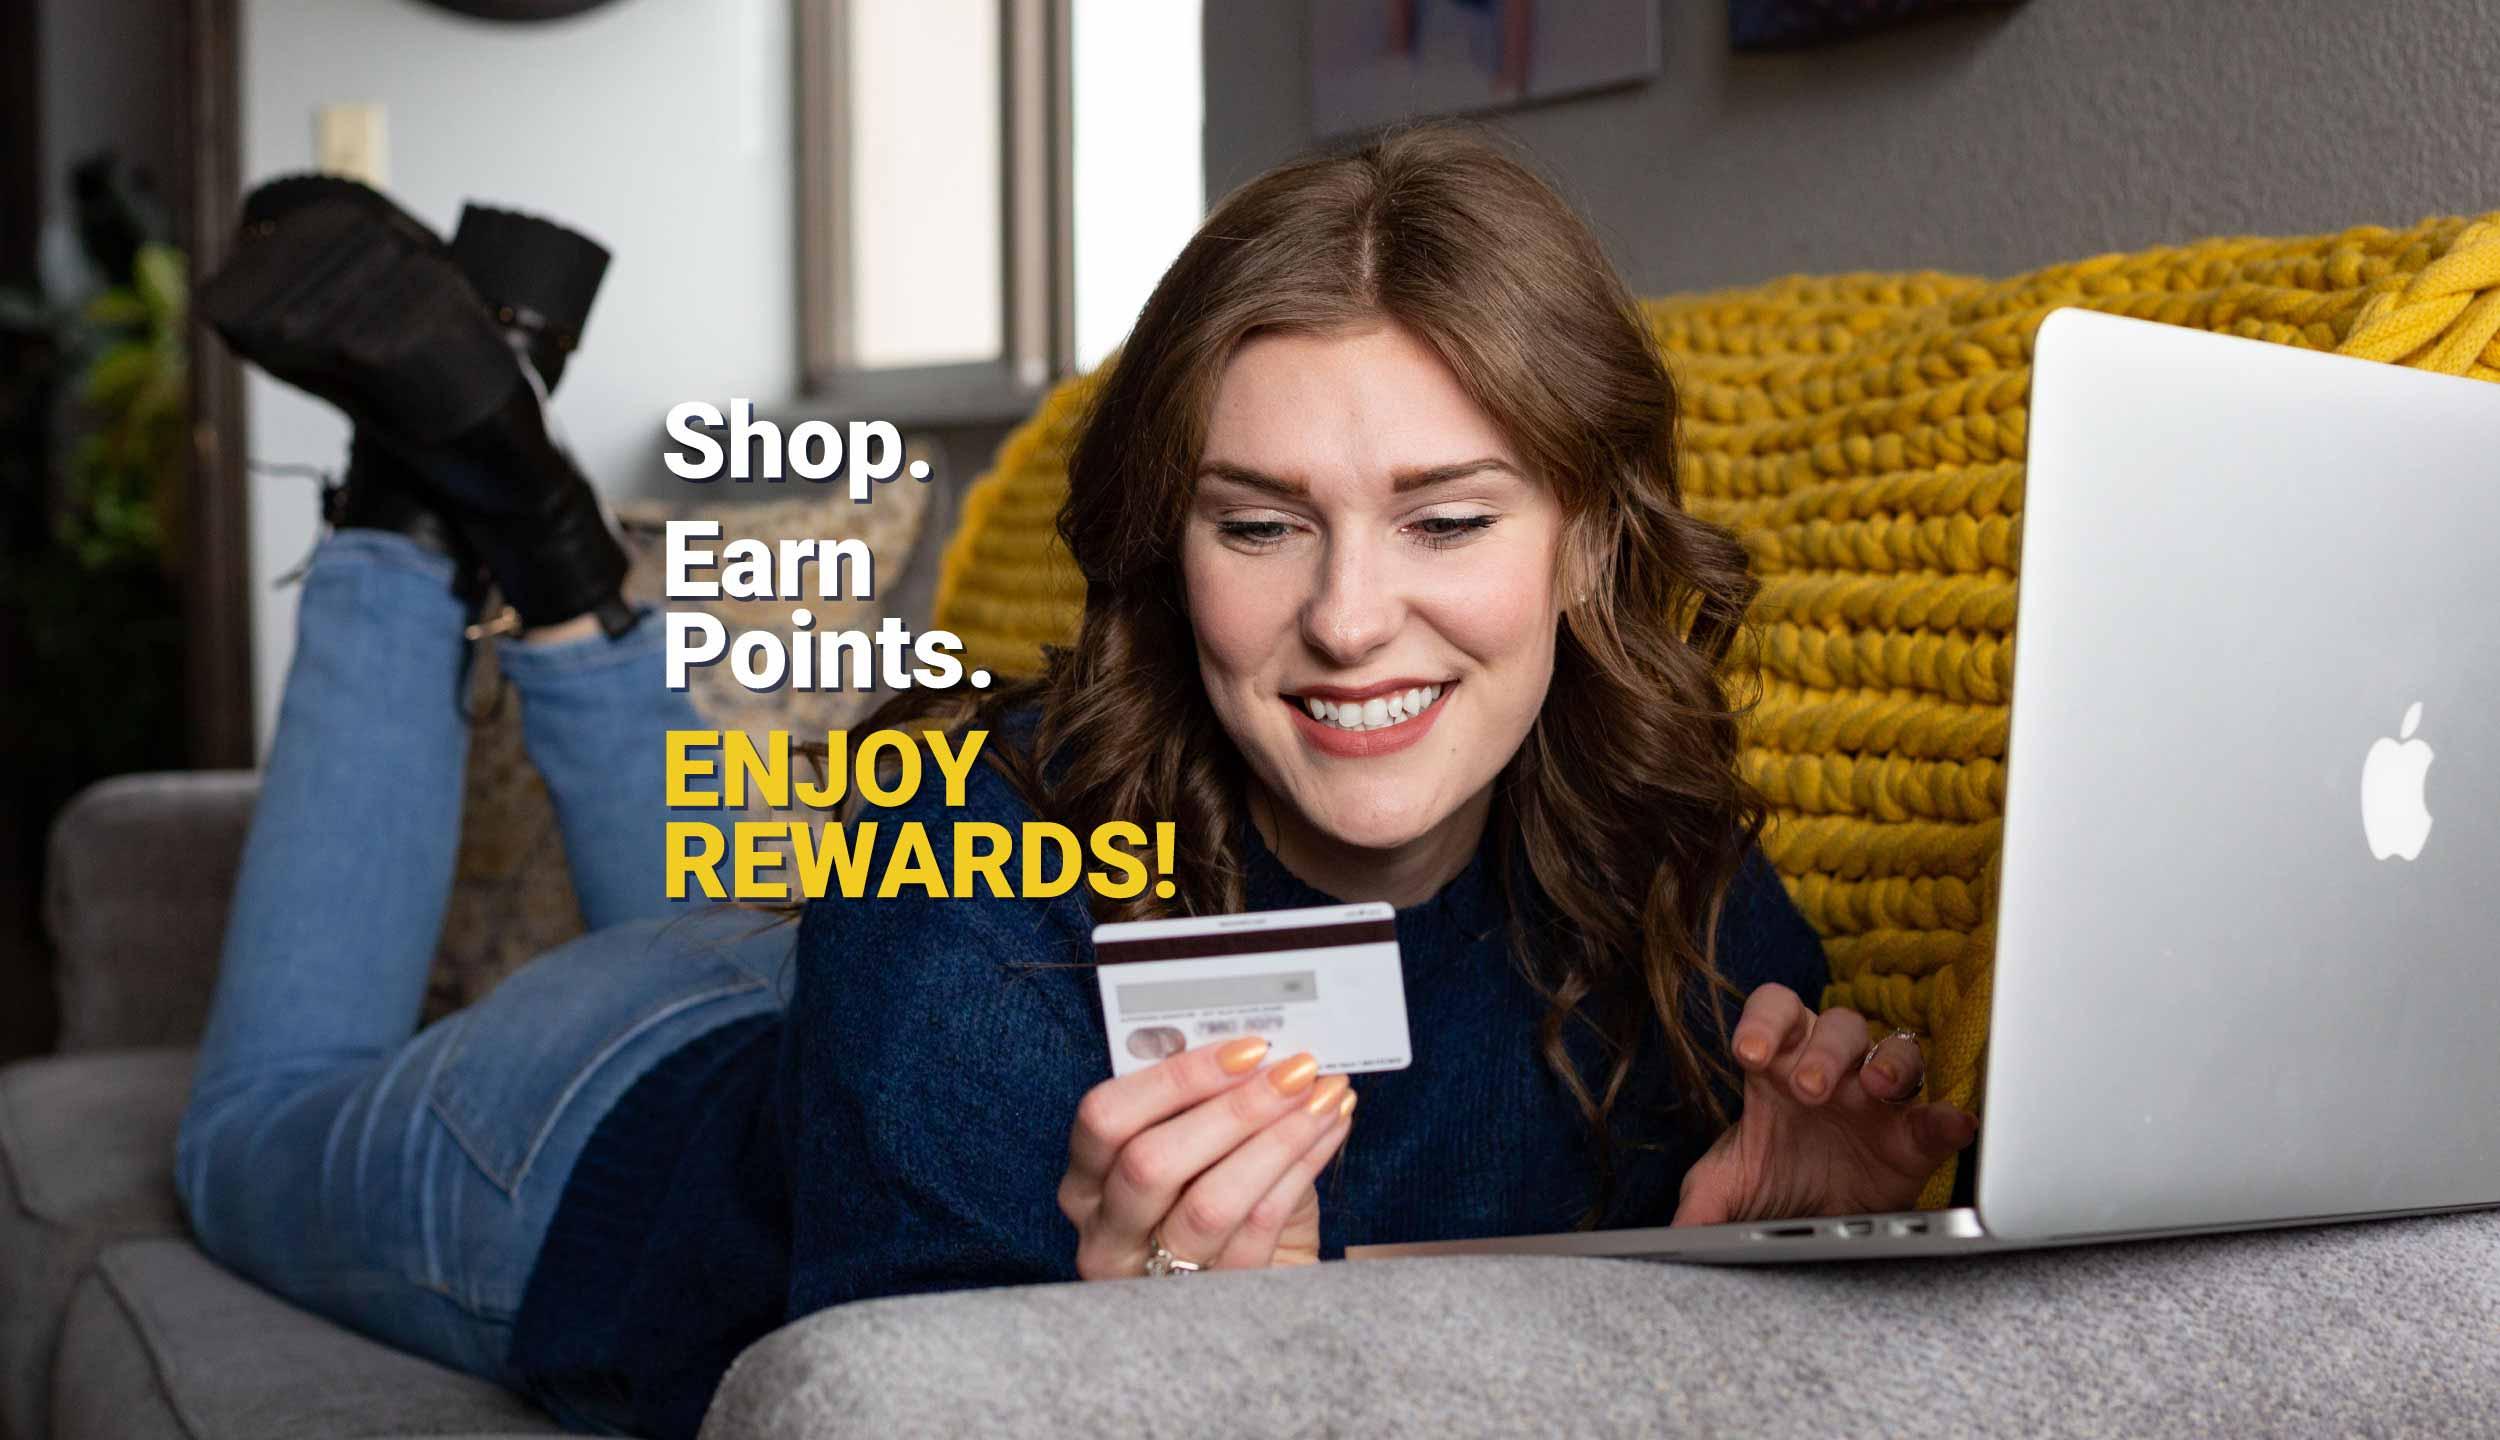 Shop, Earn Points, Enjoy Rewards!